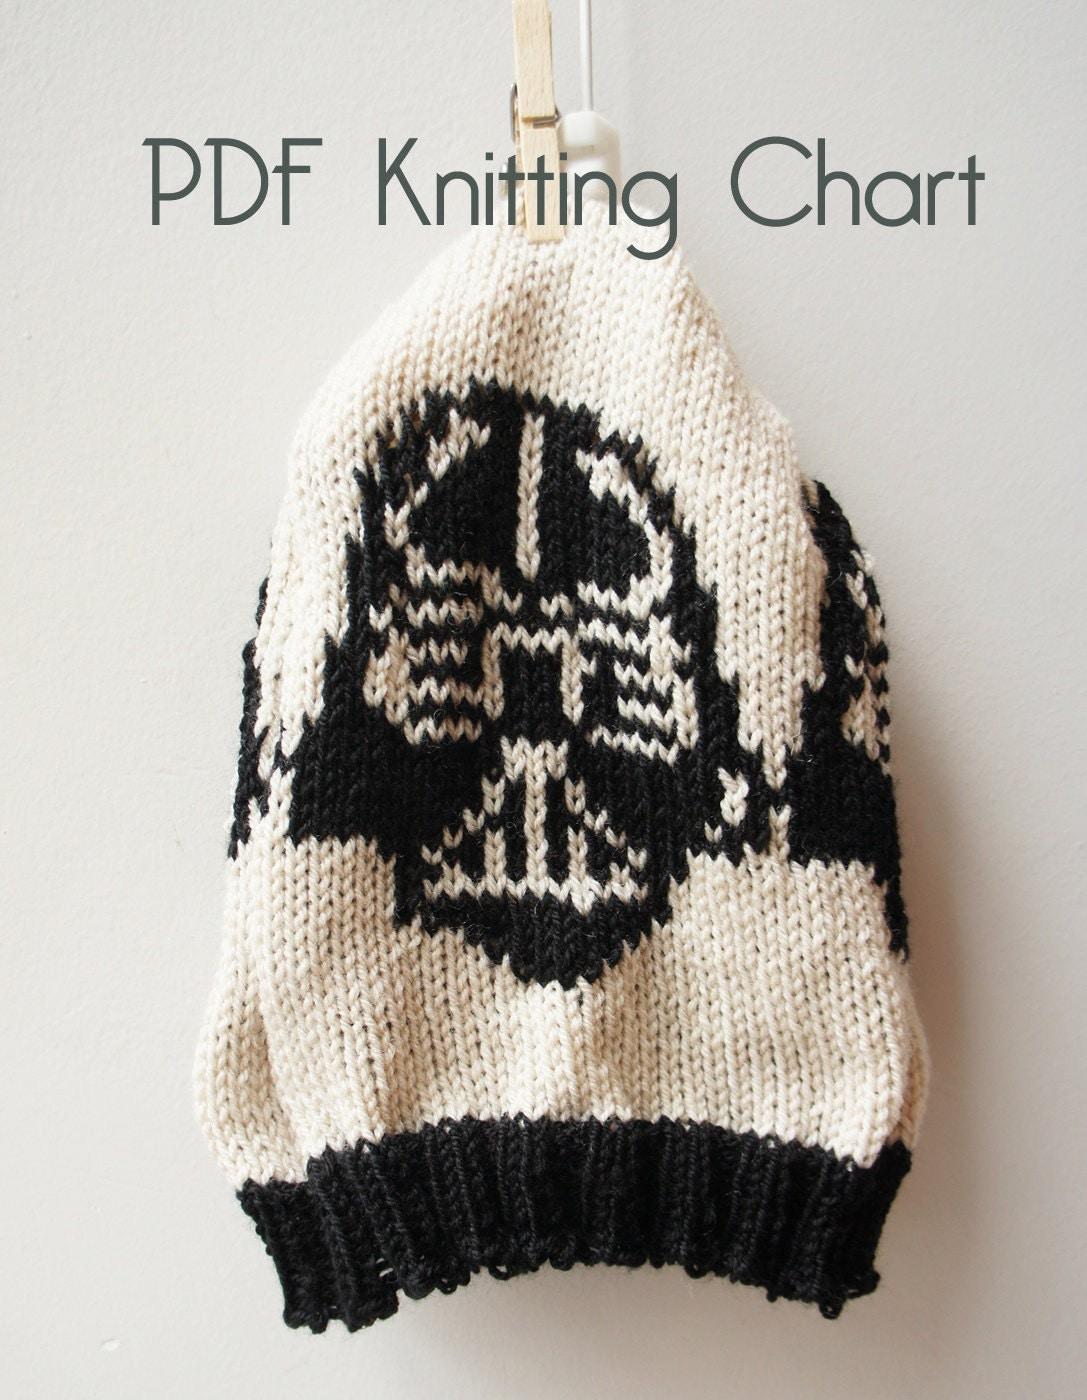 Knitting Pattern Darth Vader Hat : Darth Vader Knitting Chart for Knitting Machine by mandalinarossa